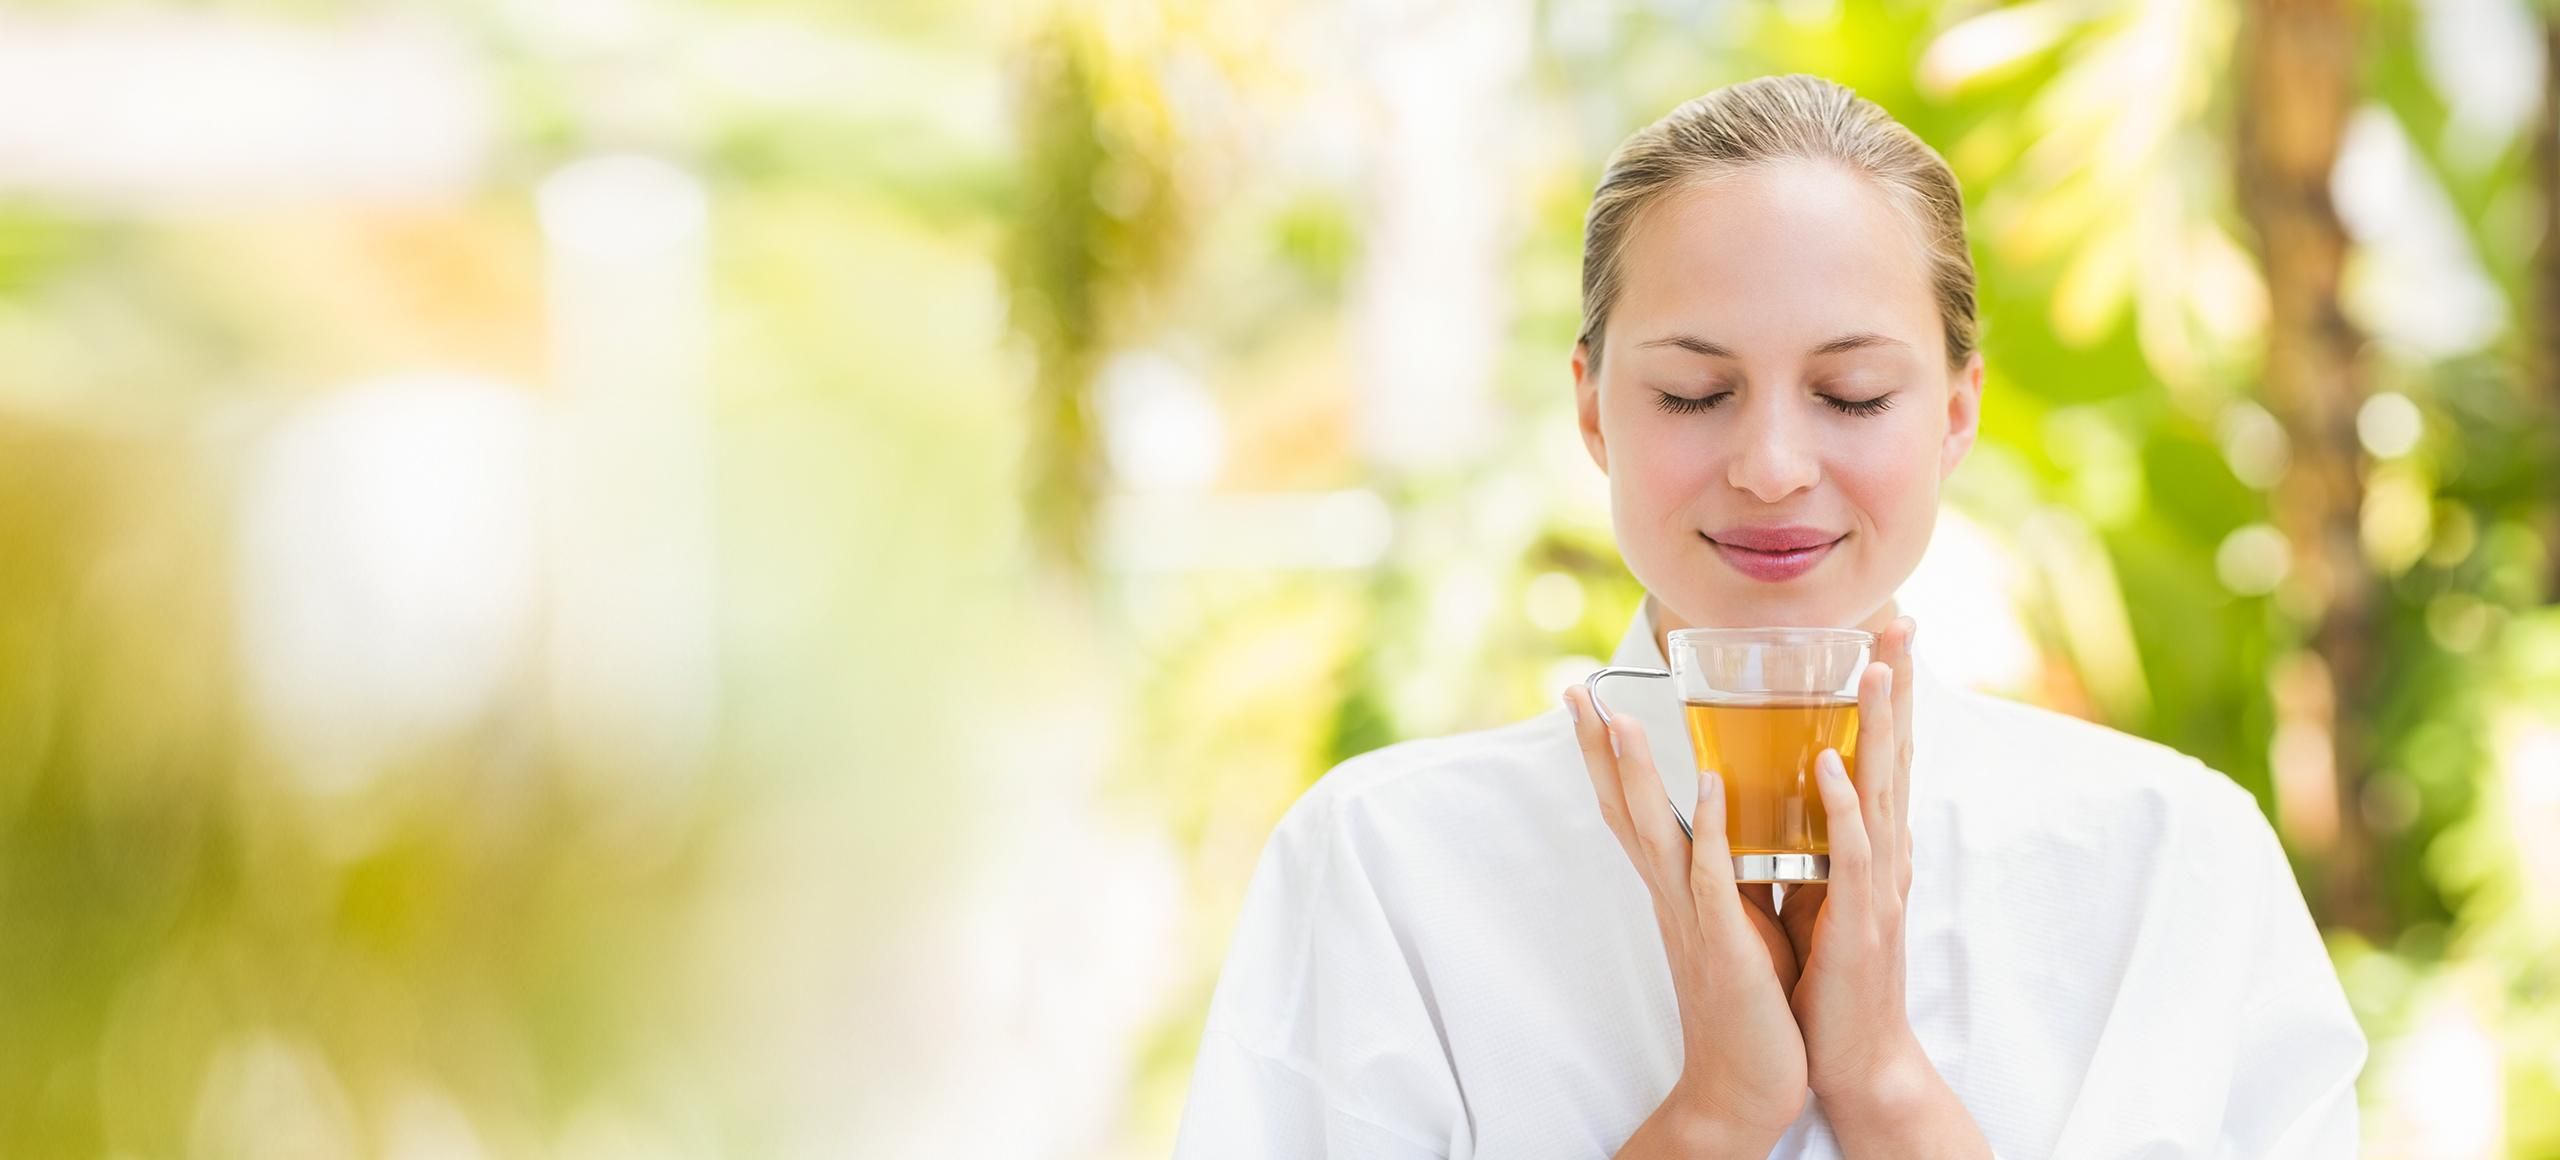 Frau genießt Tee in der Natur